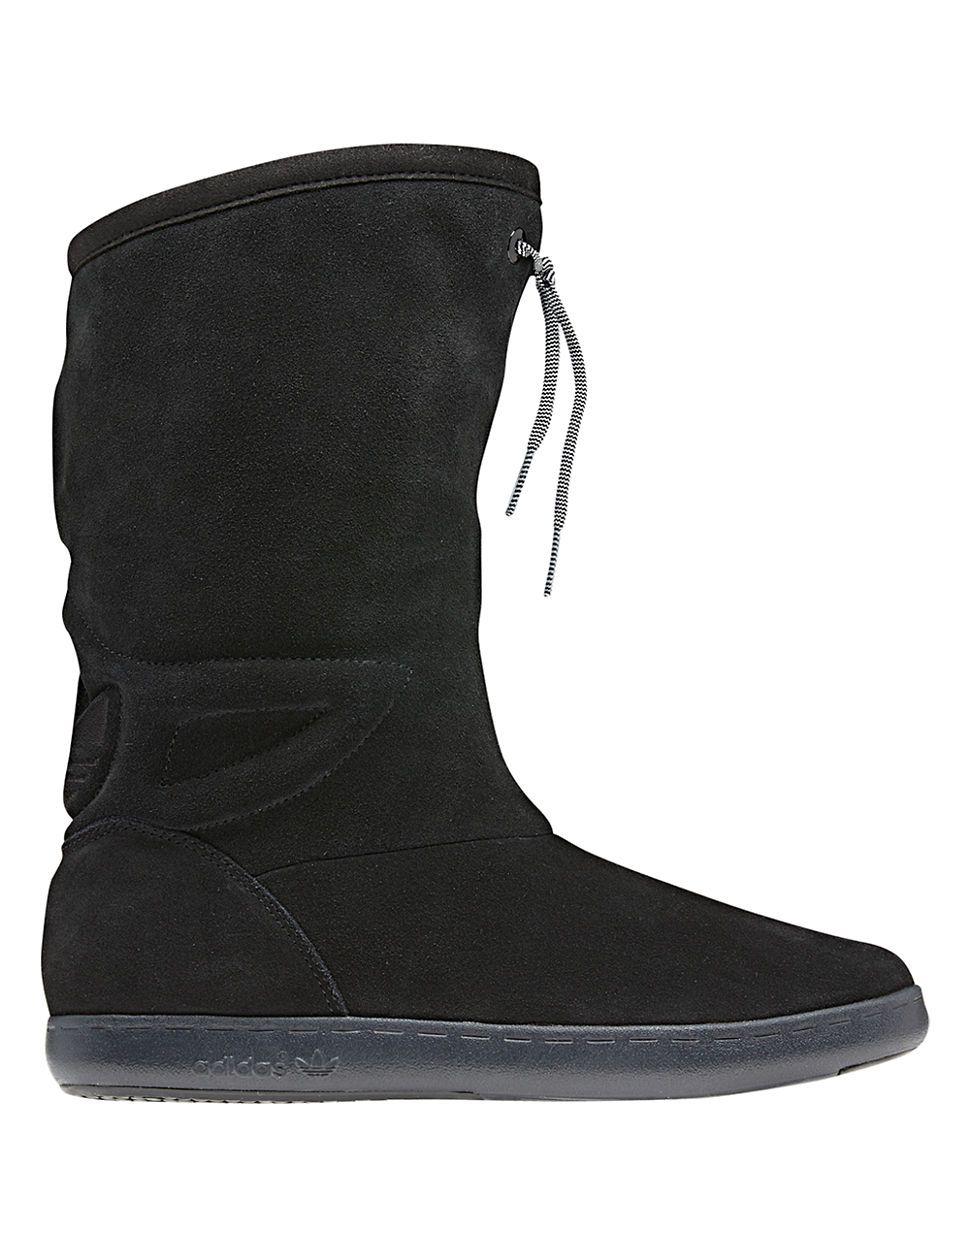 b5360991 adidas m attitude winter hi w off 55% - www.axes-usinage.com